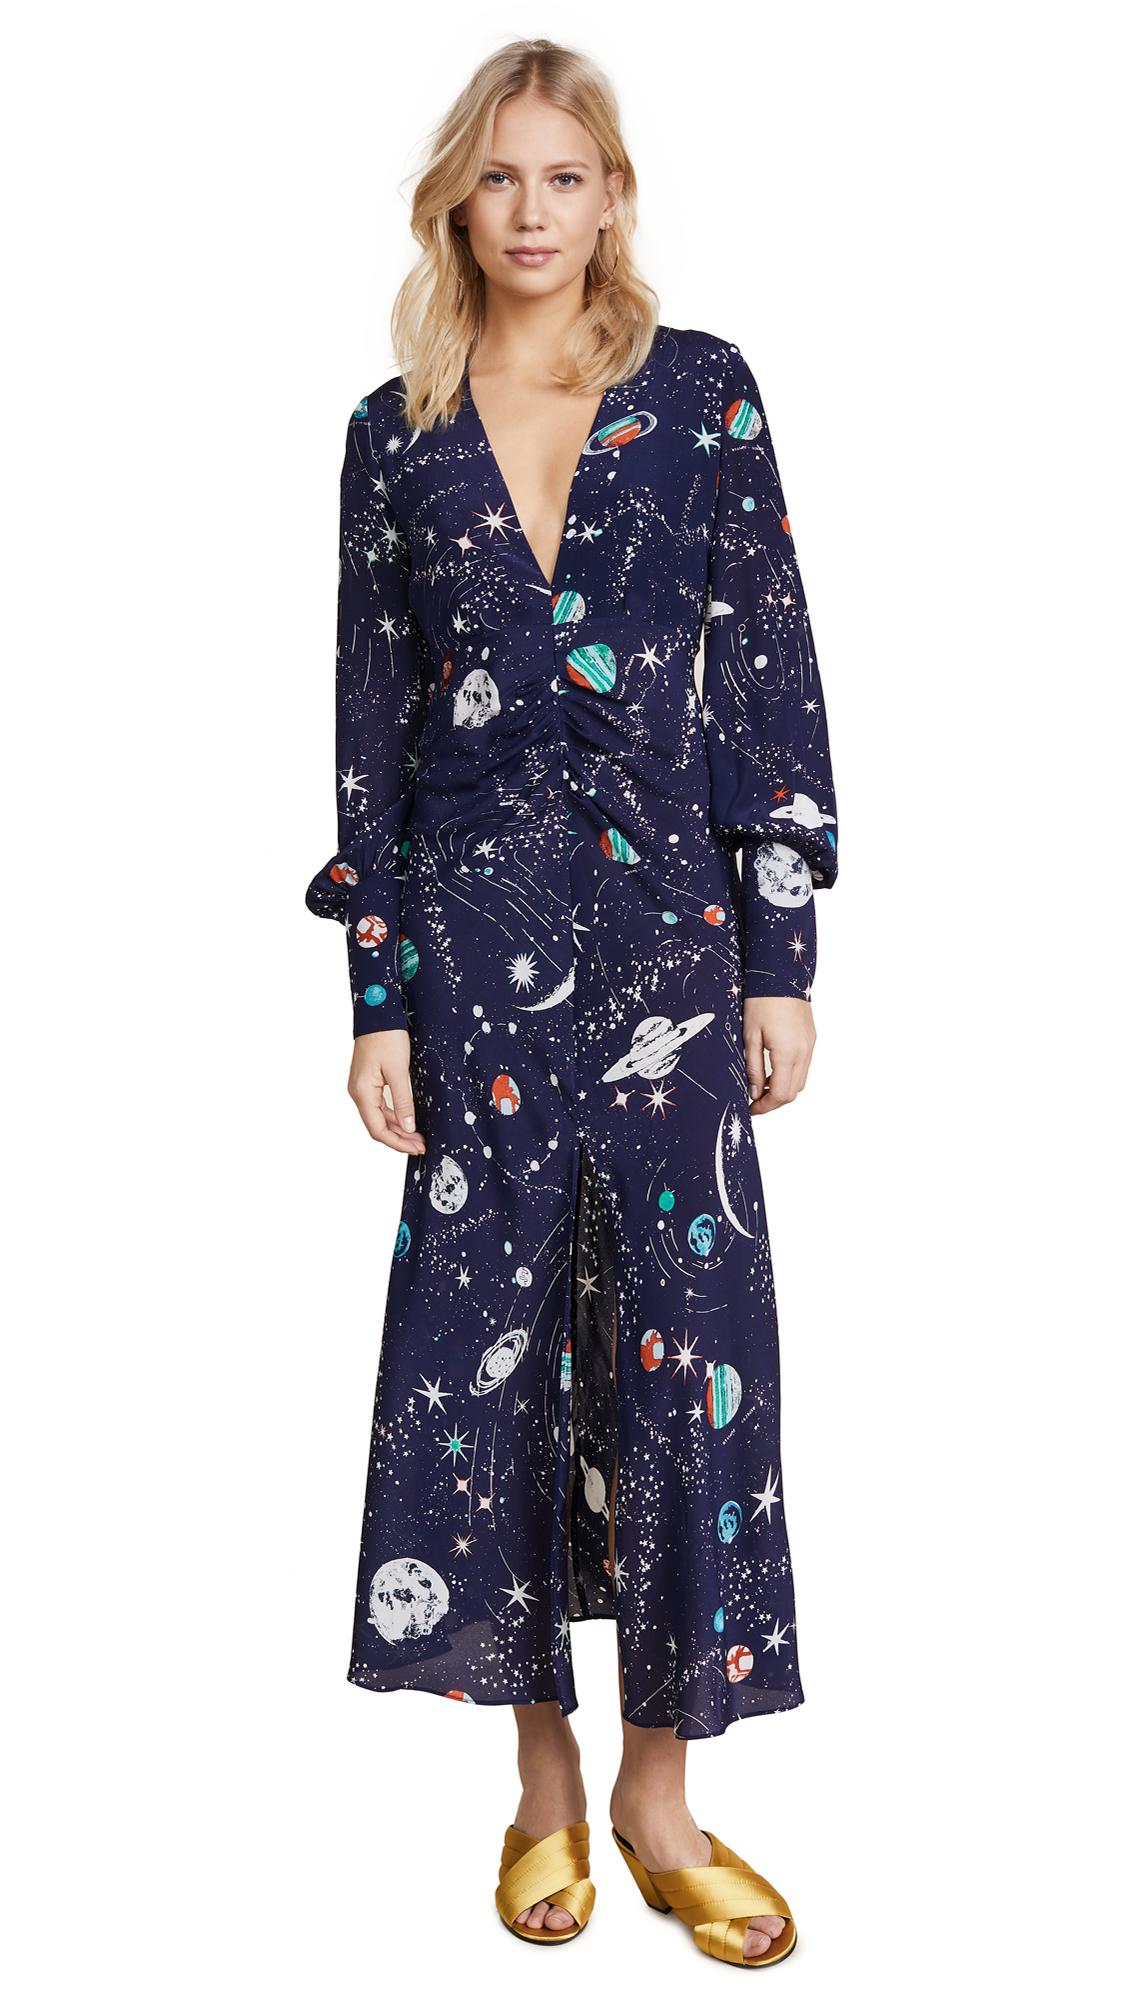 RIXO London Maressa Dress - Cosmic Constellation